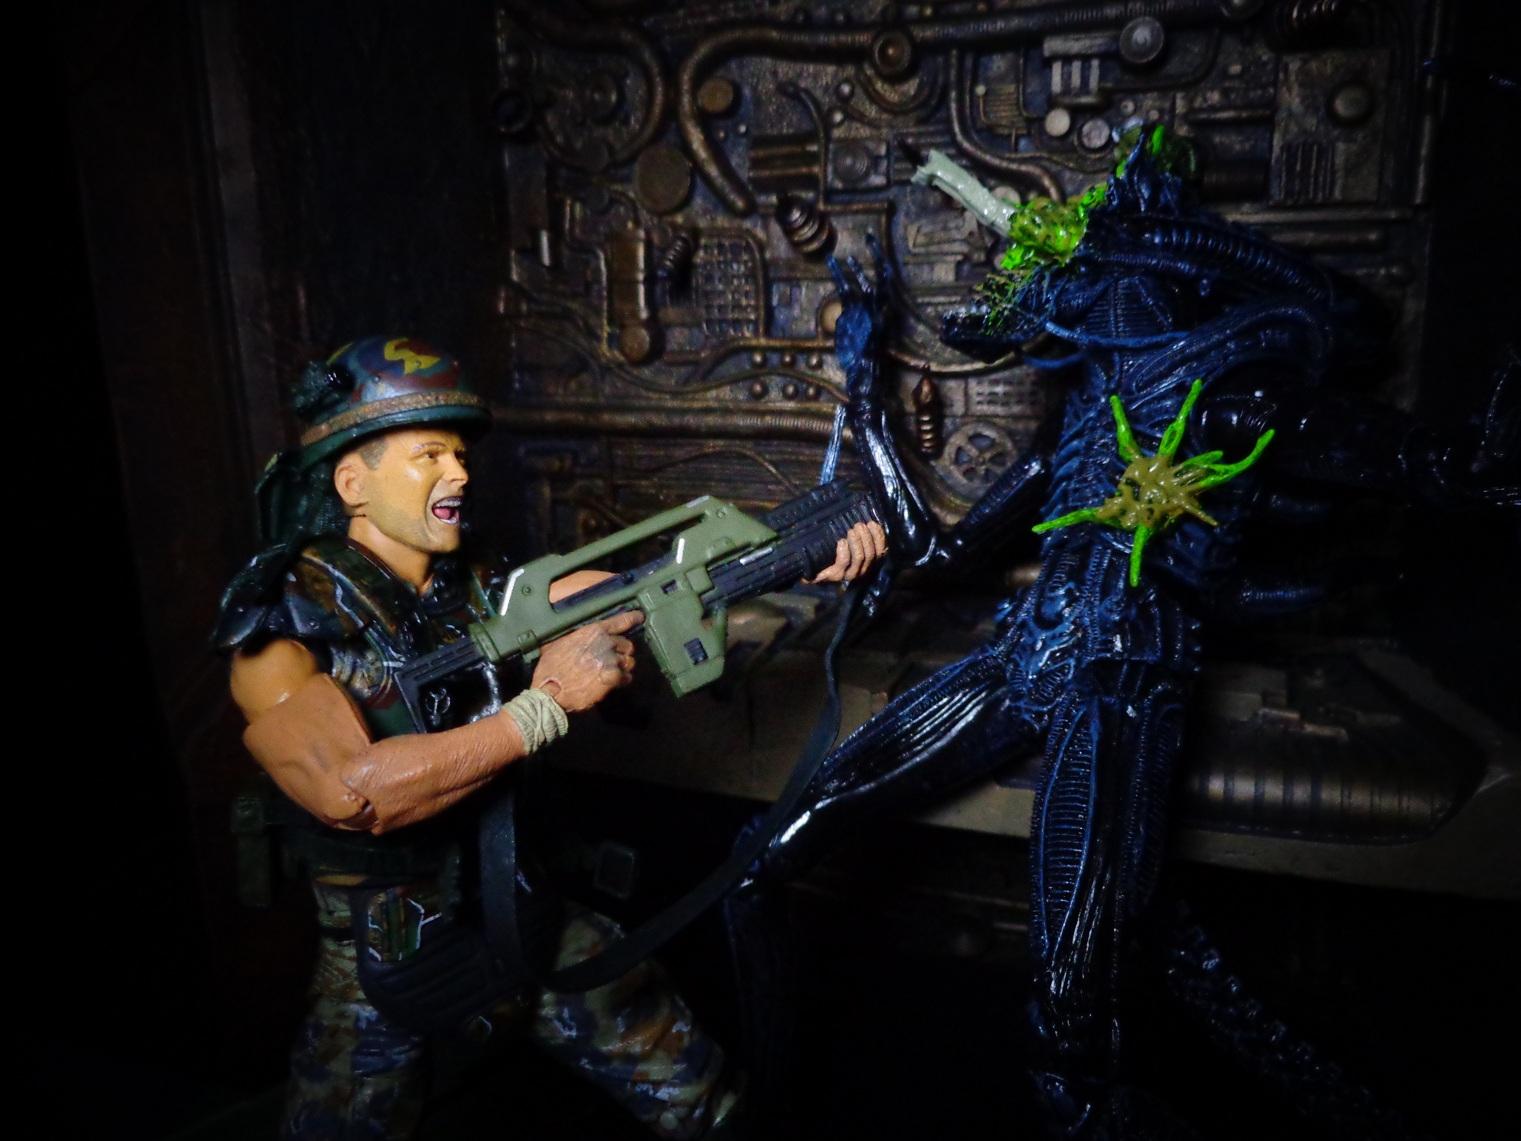 Neca Aliens Series 1 Hicks Hudson Amp Alien Warrior